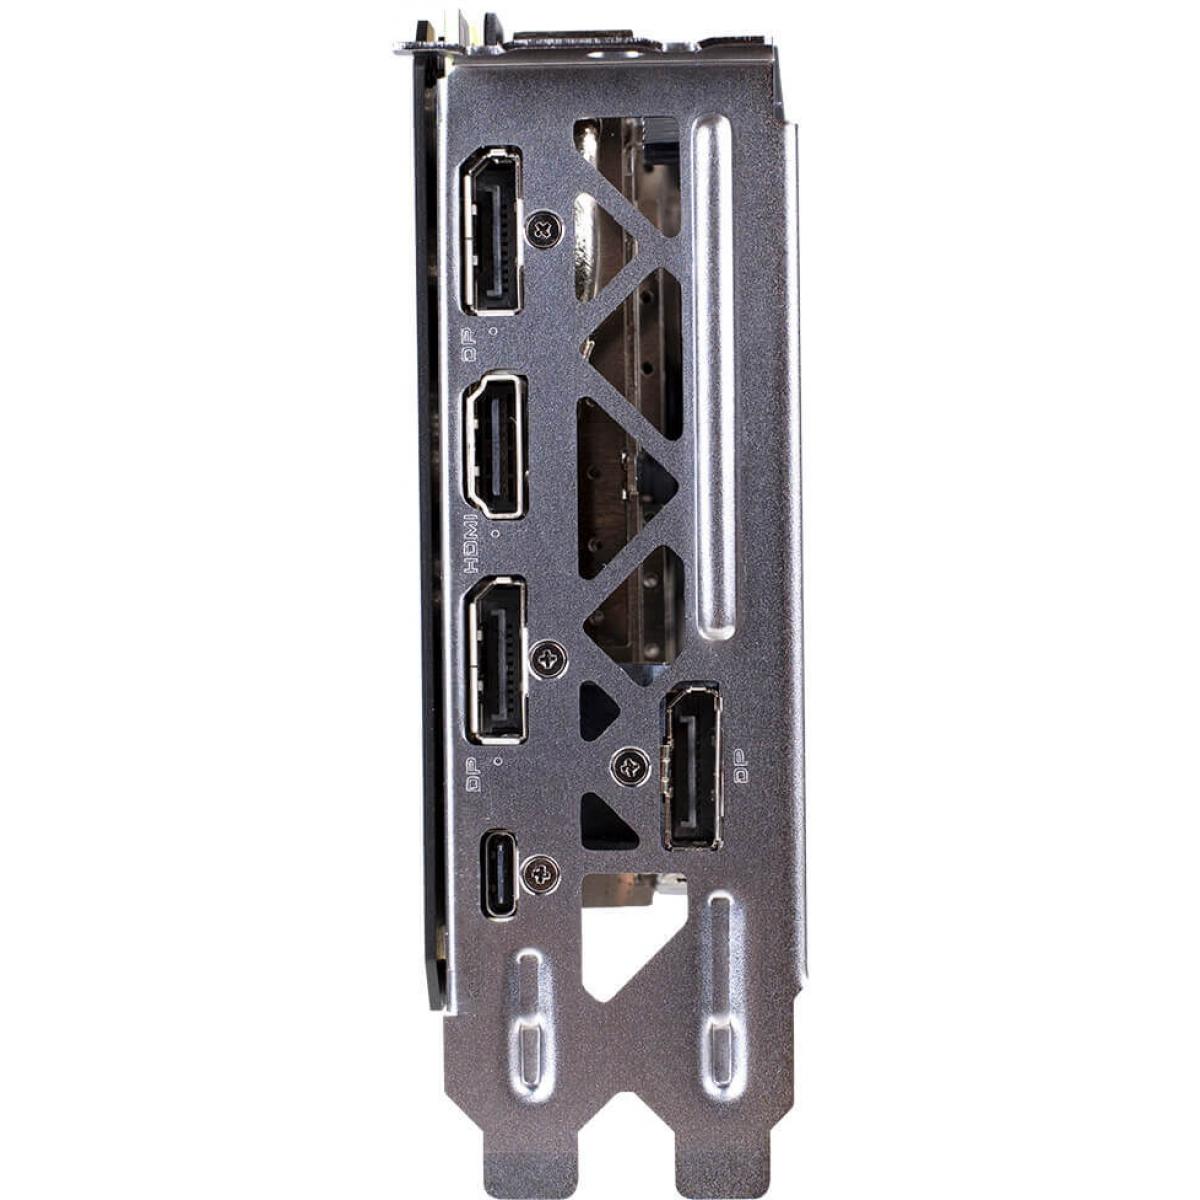 Placa de Vídeo EVGA Geforce RTX 2070 XC Gaming Dual, 8GB GDDR6, 256Bit, 08G-P4-2172-KR